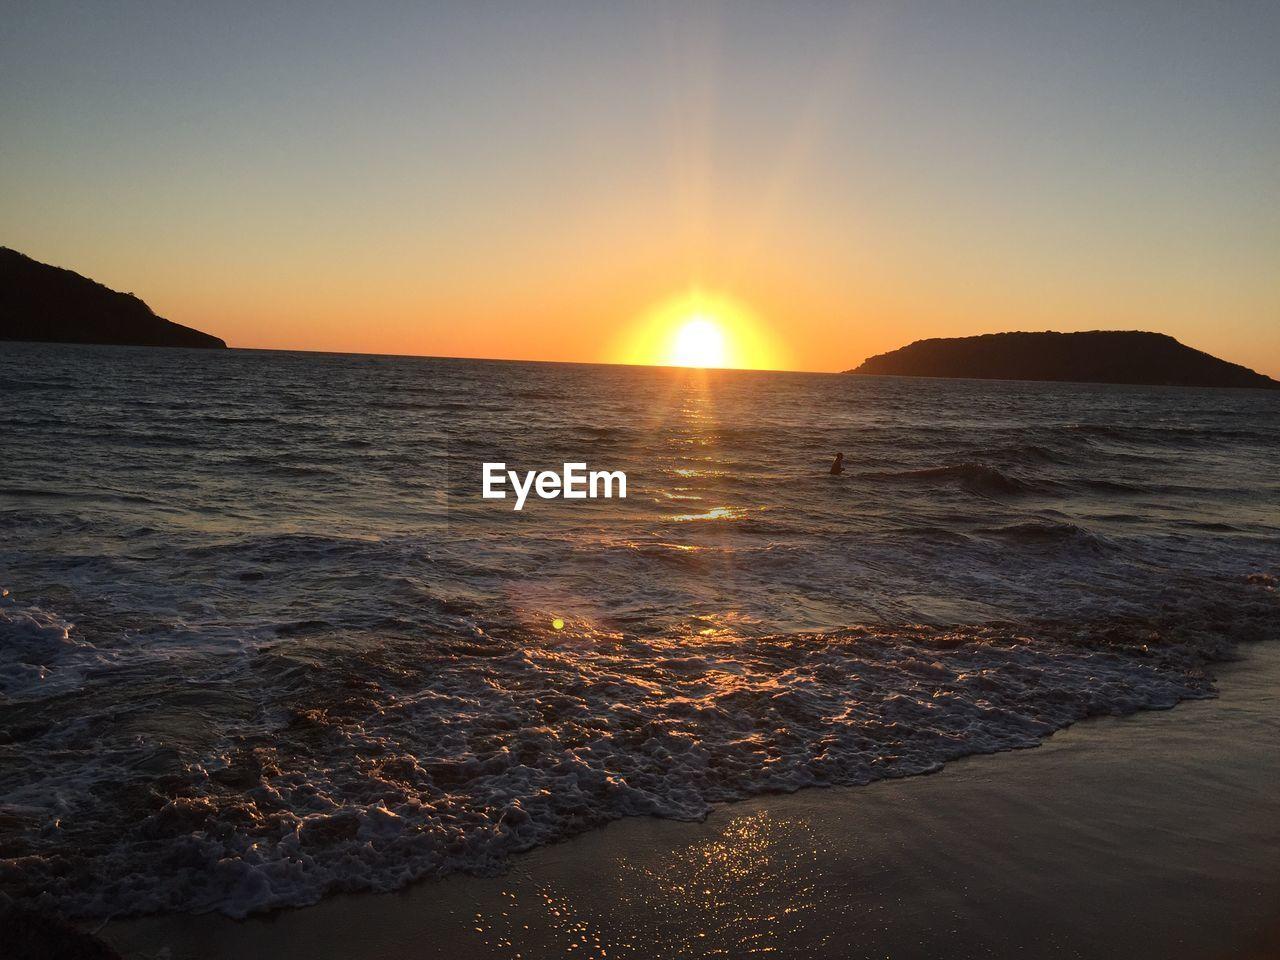 sunset, sky, water, beauty in nature, sea, scenics - nature, sun, tranquility, tranquil scene, land, beach, idyllic, nature, sunlight, horizon, no people, orange color, non-urban scene, wave, horizon over water, lens flare, outdoors